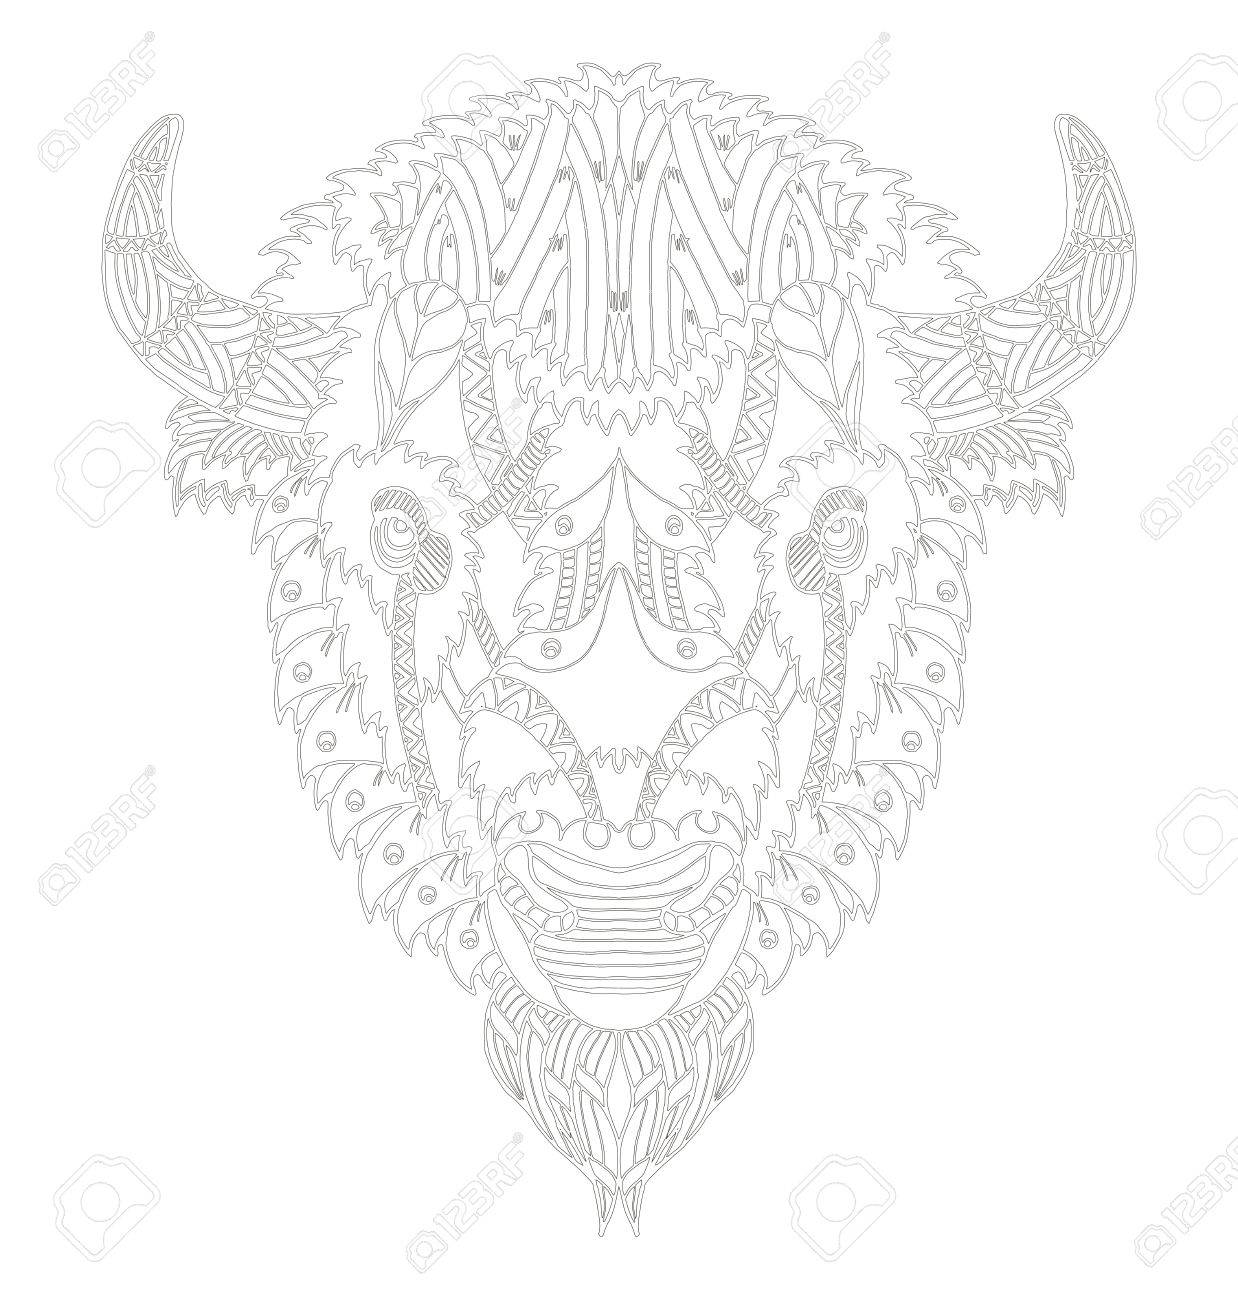 Cabeza De Búfalo Americano Zentangle Estilizado, Vector, Ilustración ...